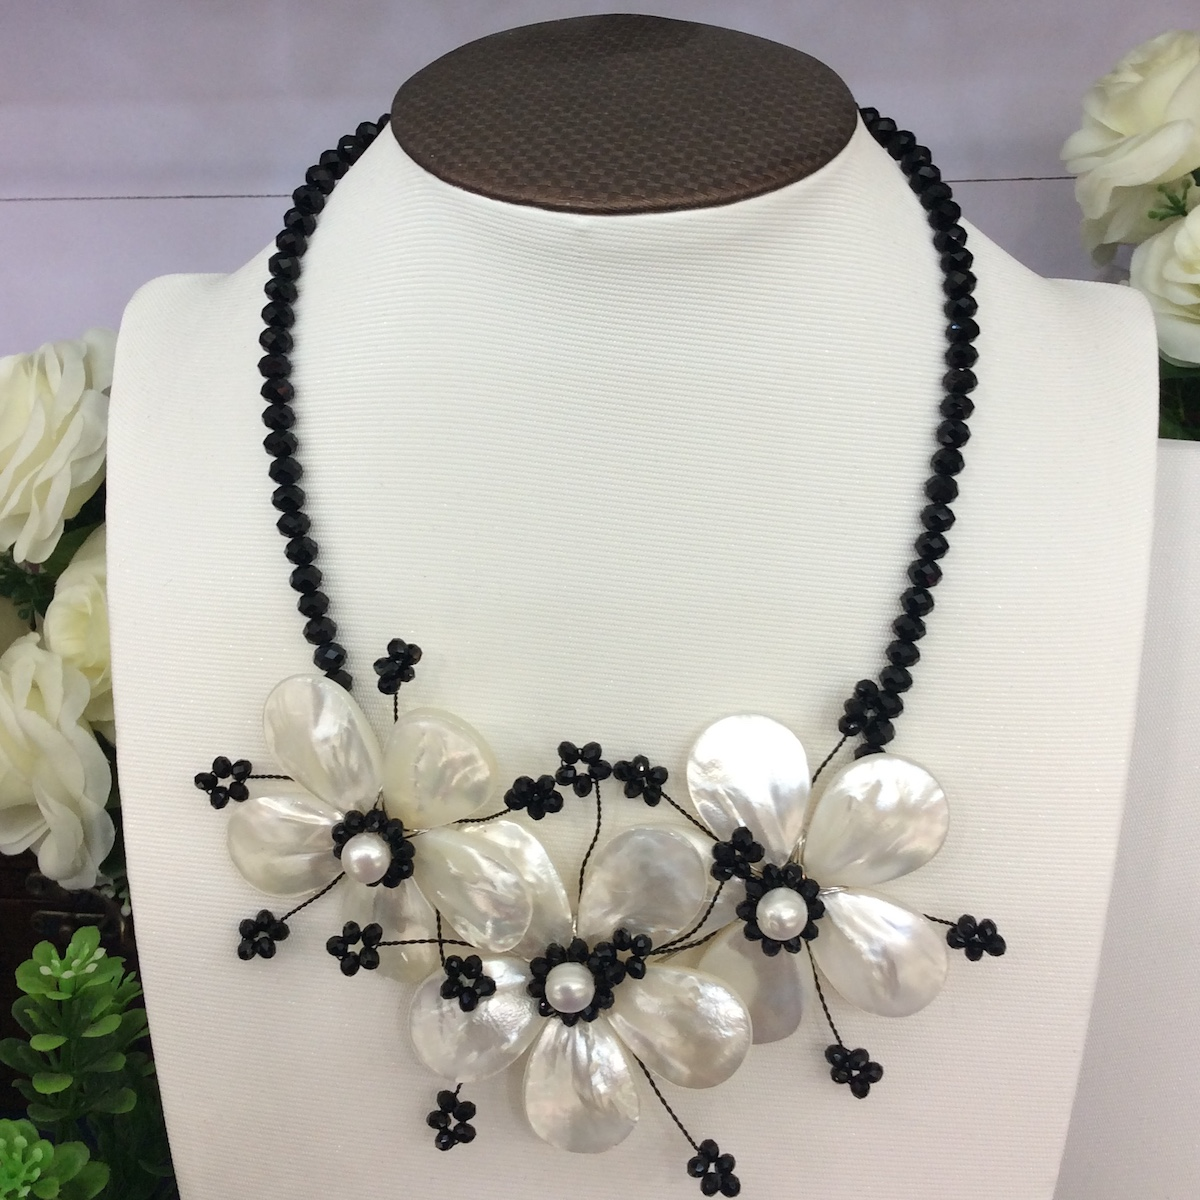 2019 New Fashion Black Crystal White Sea Shell Flower Choker Necklace Boho Party Jewelry Female